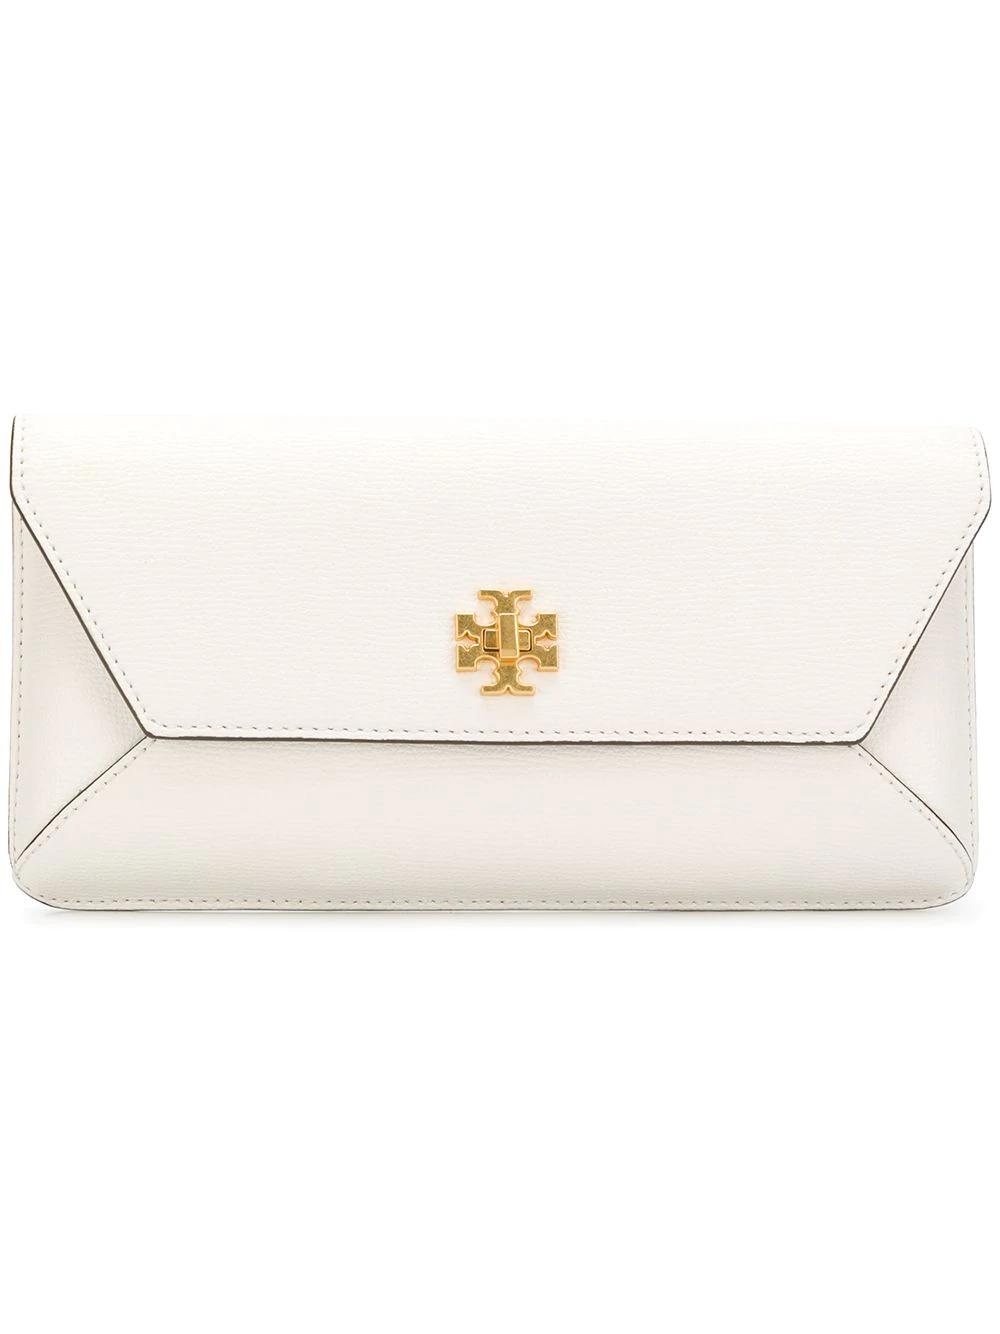 3119a857e5e1 Tory Burch Kira Envelope Clutch - White